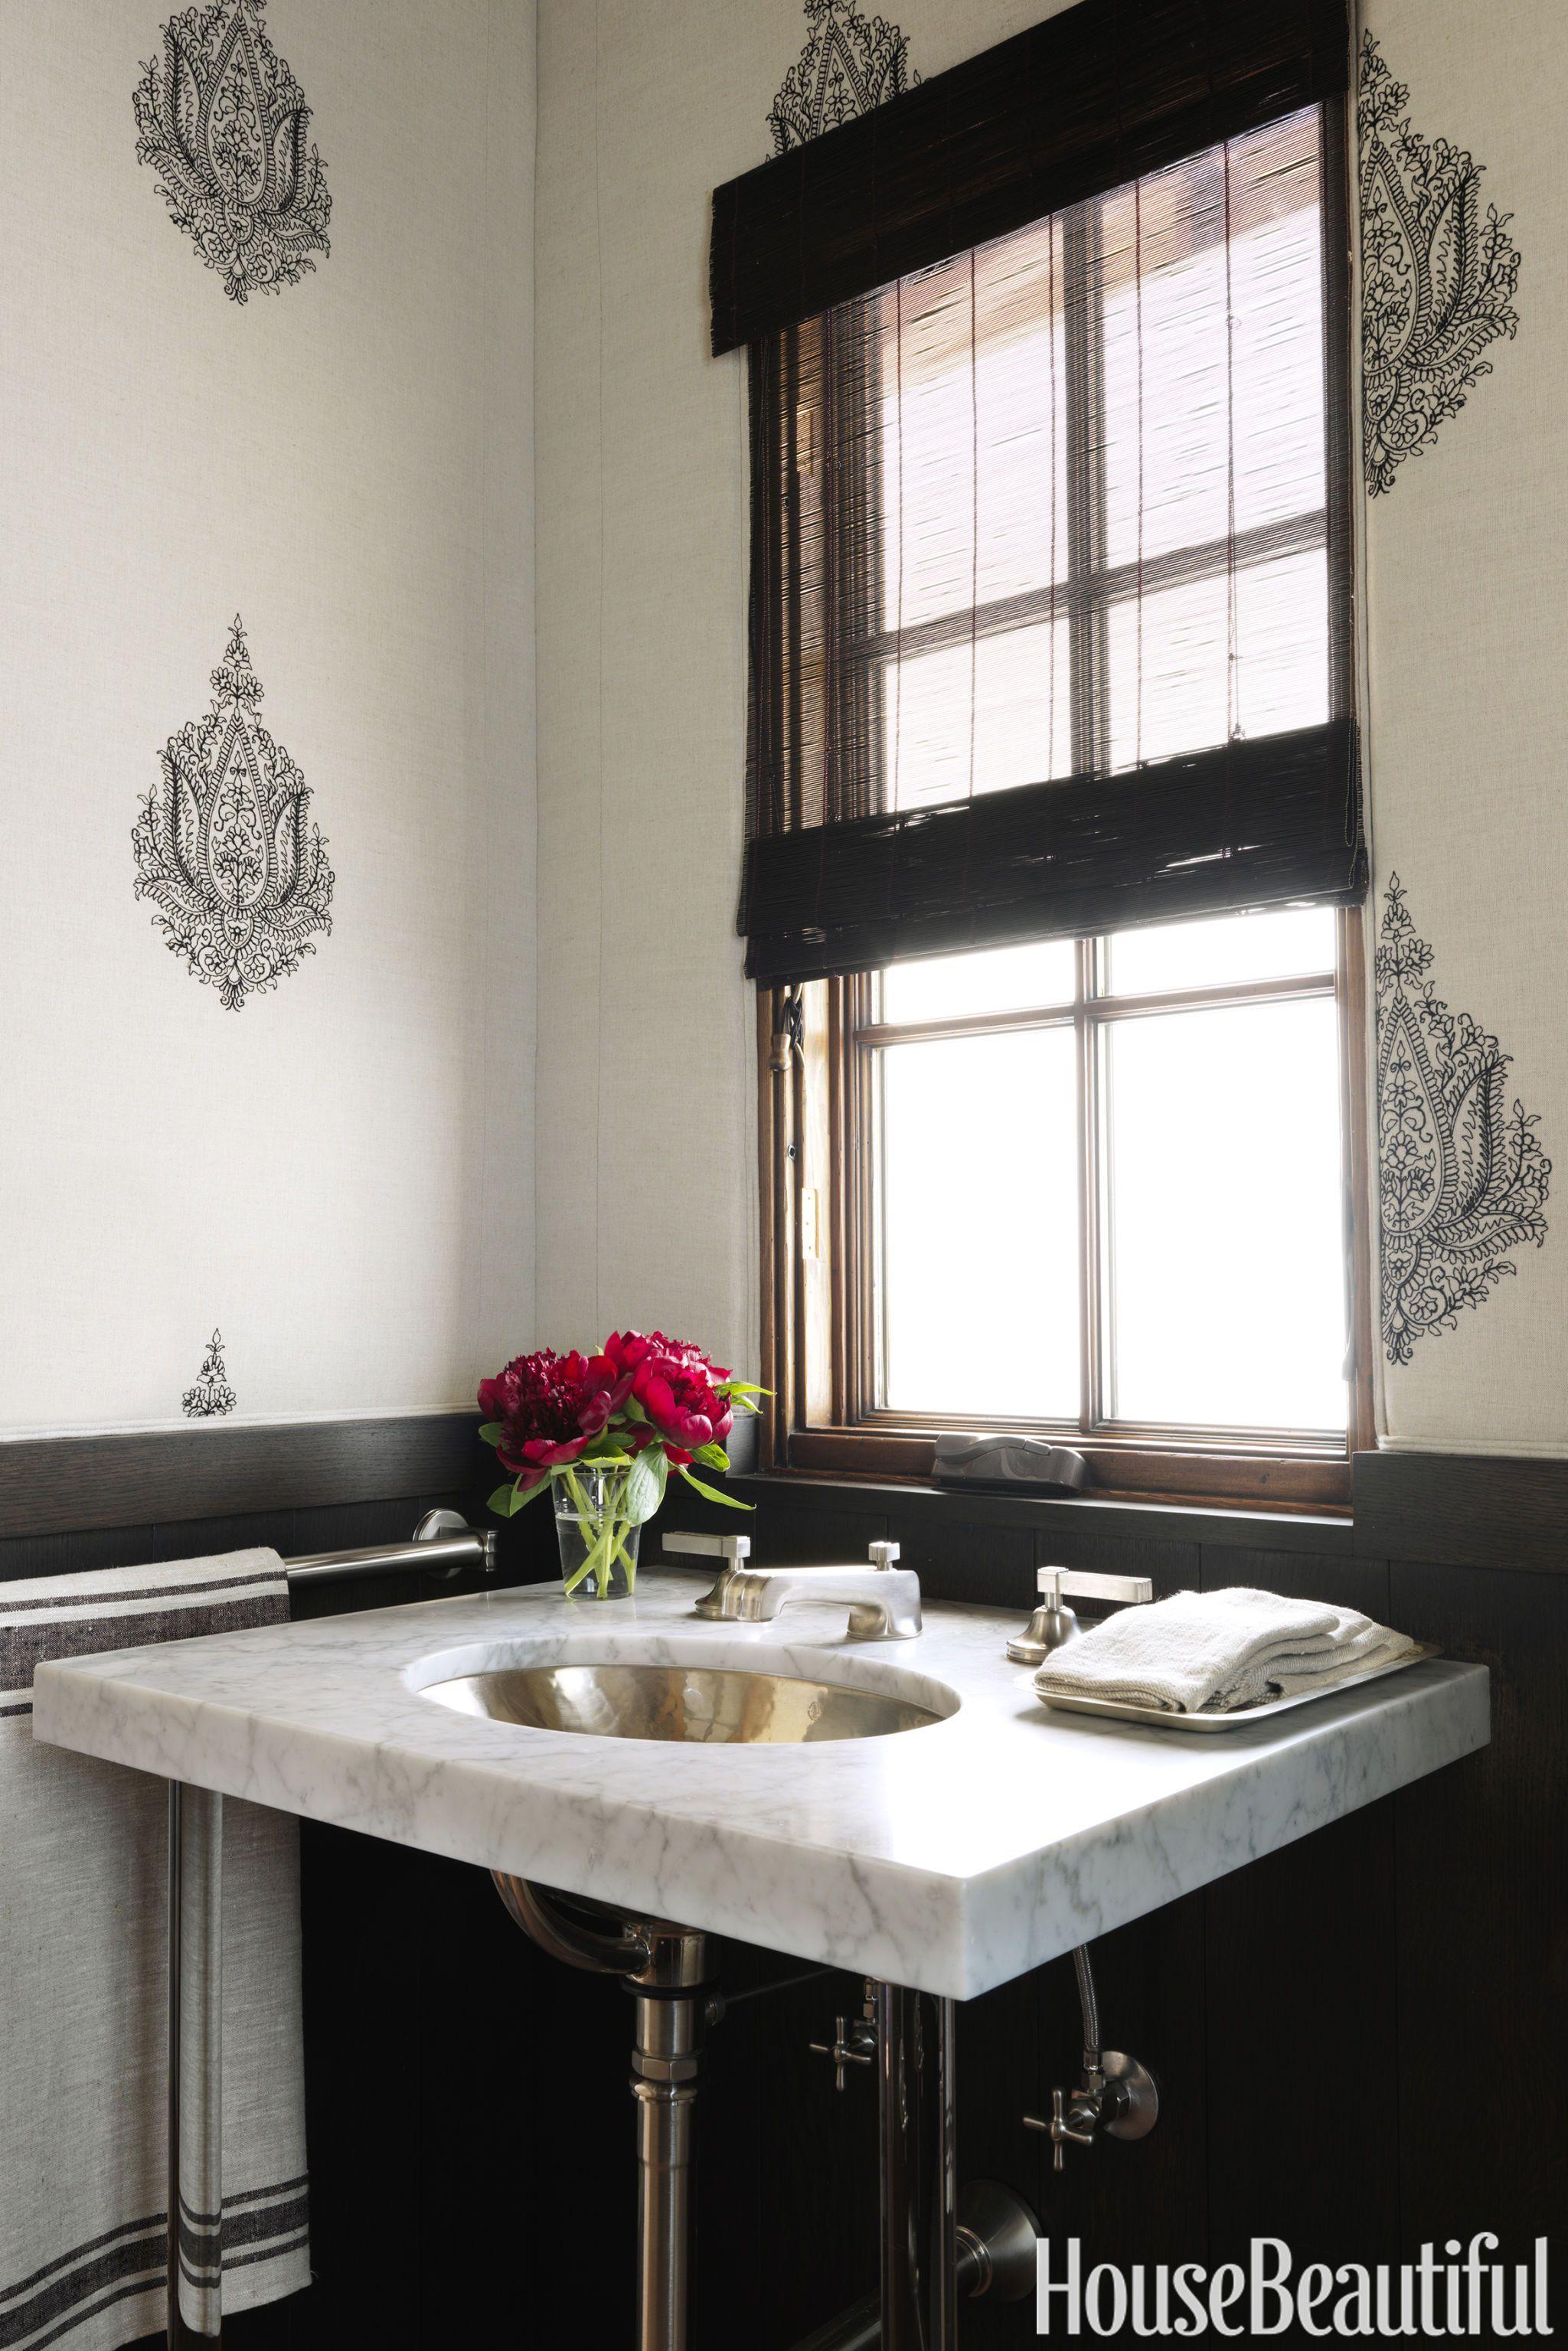 Black and white bathroom - design, photo